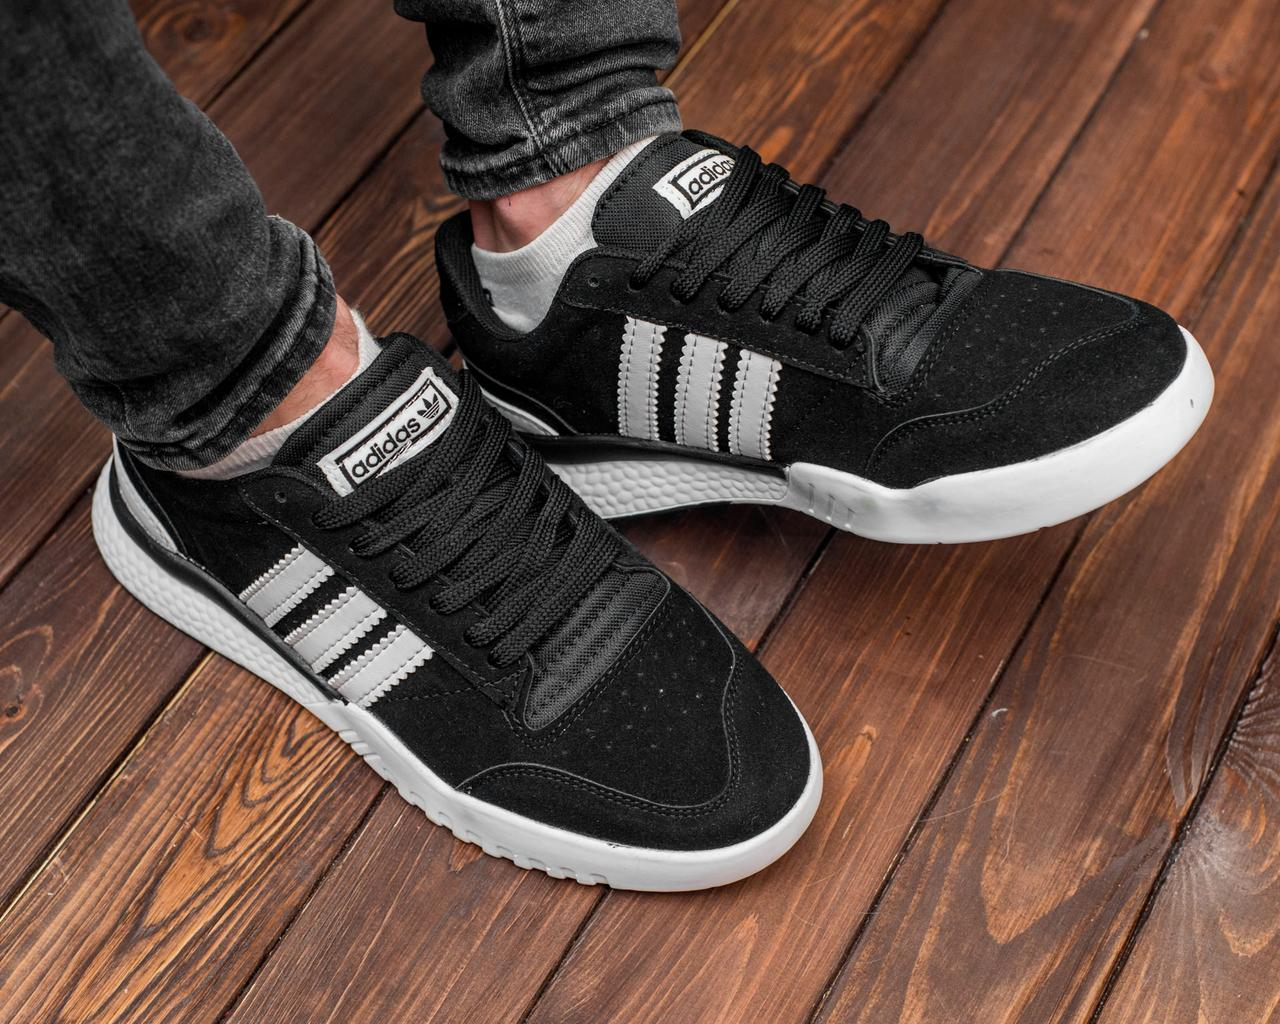 Мужские кроссовки Adidas Neo, мужские кроссовки адидас нео, чоловічі кросівки Adidas Neo, Adidas EQT Support